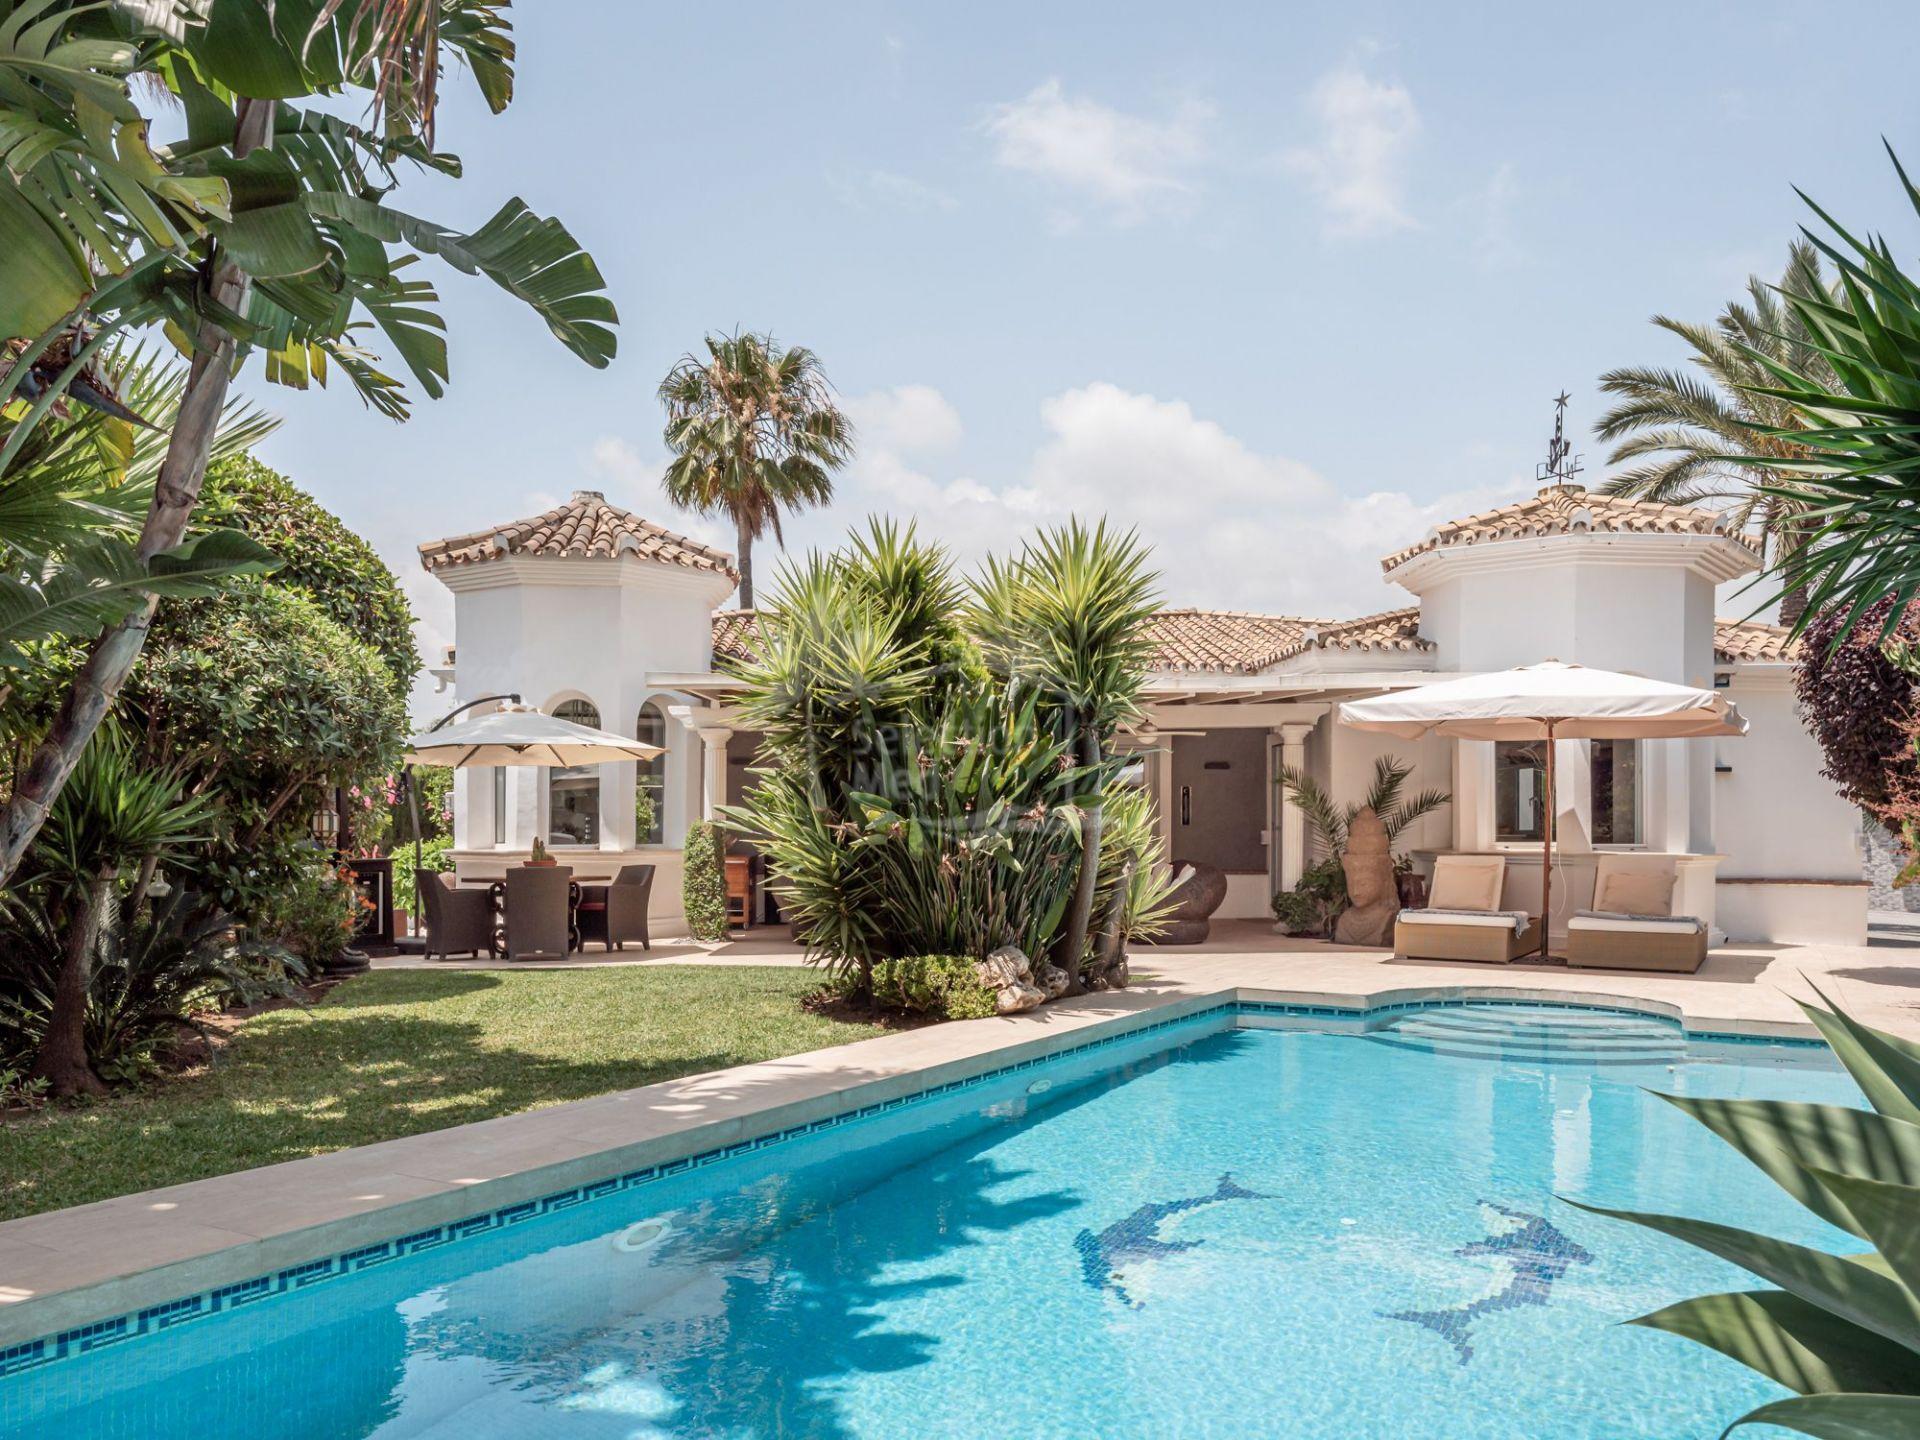 House in Nueva Andalucia, Marbella